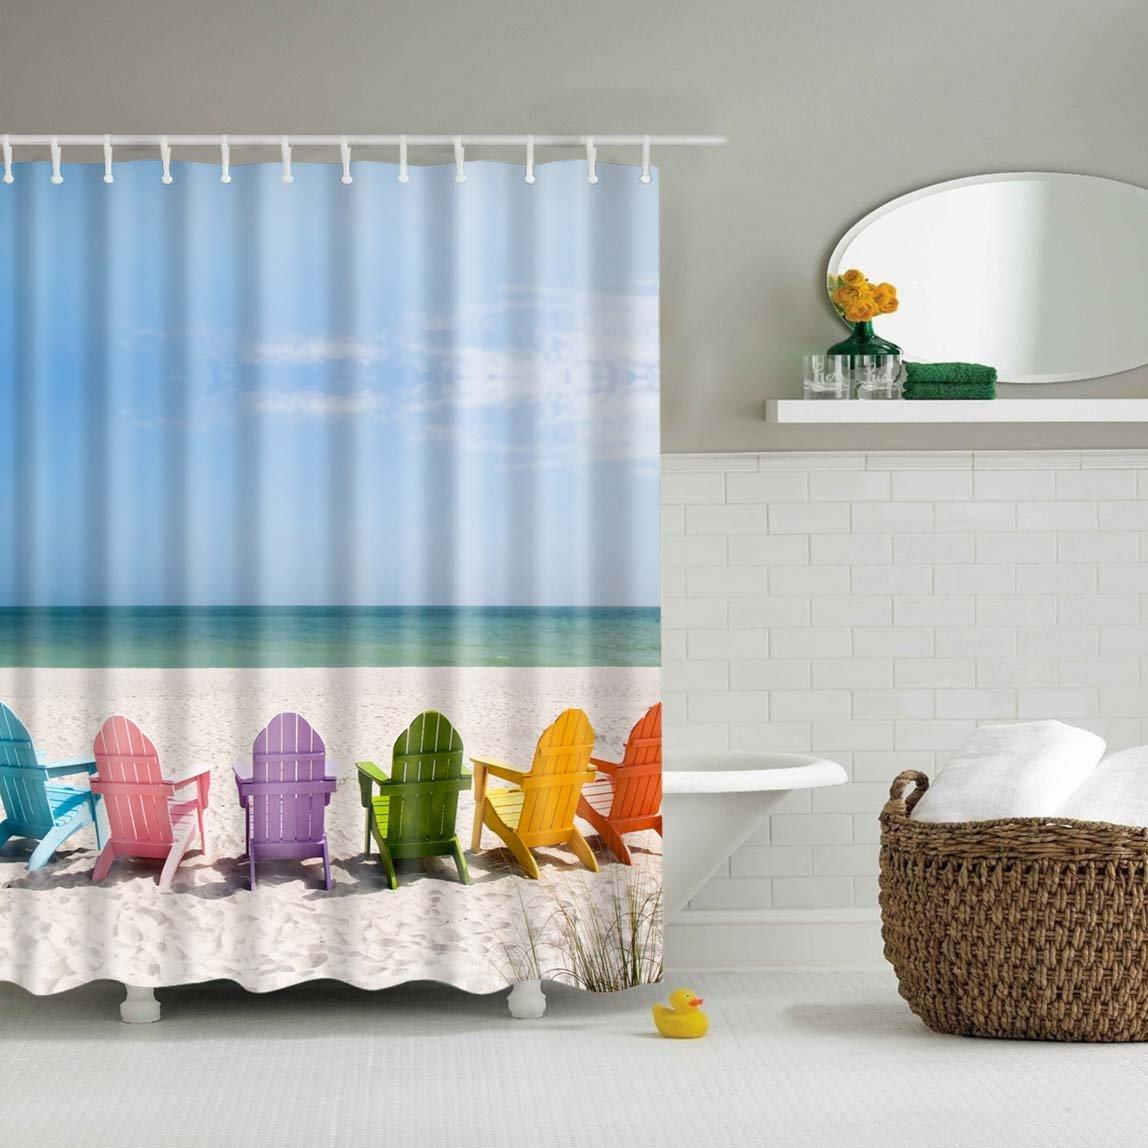 Summer Seashells Beach Shower Curtain Set Fabric Bathroom Curtains 180*180cm